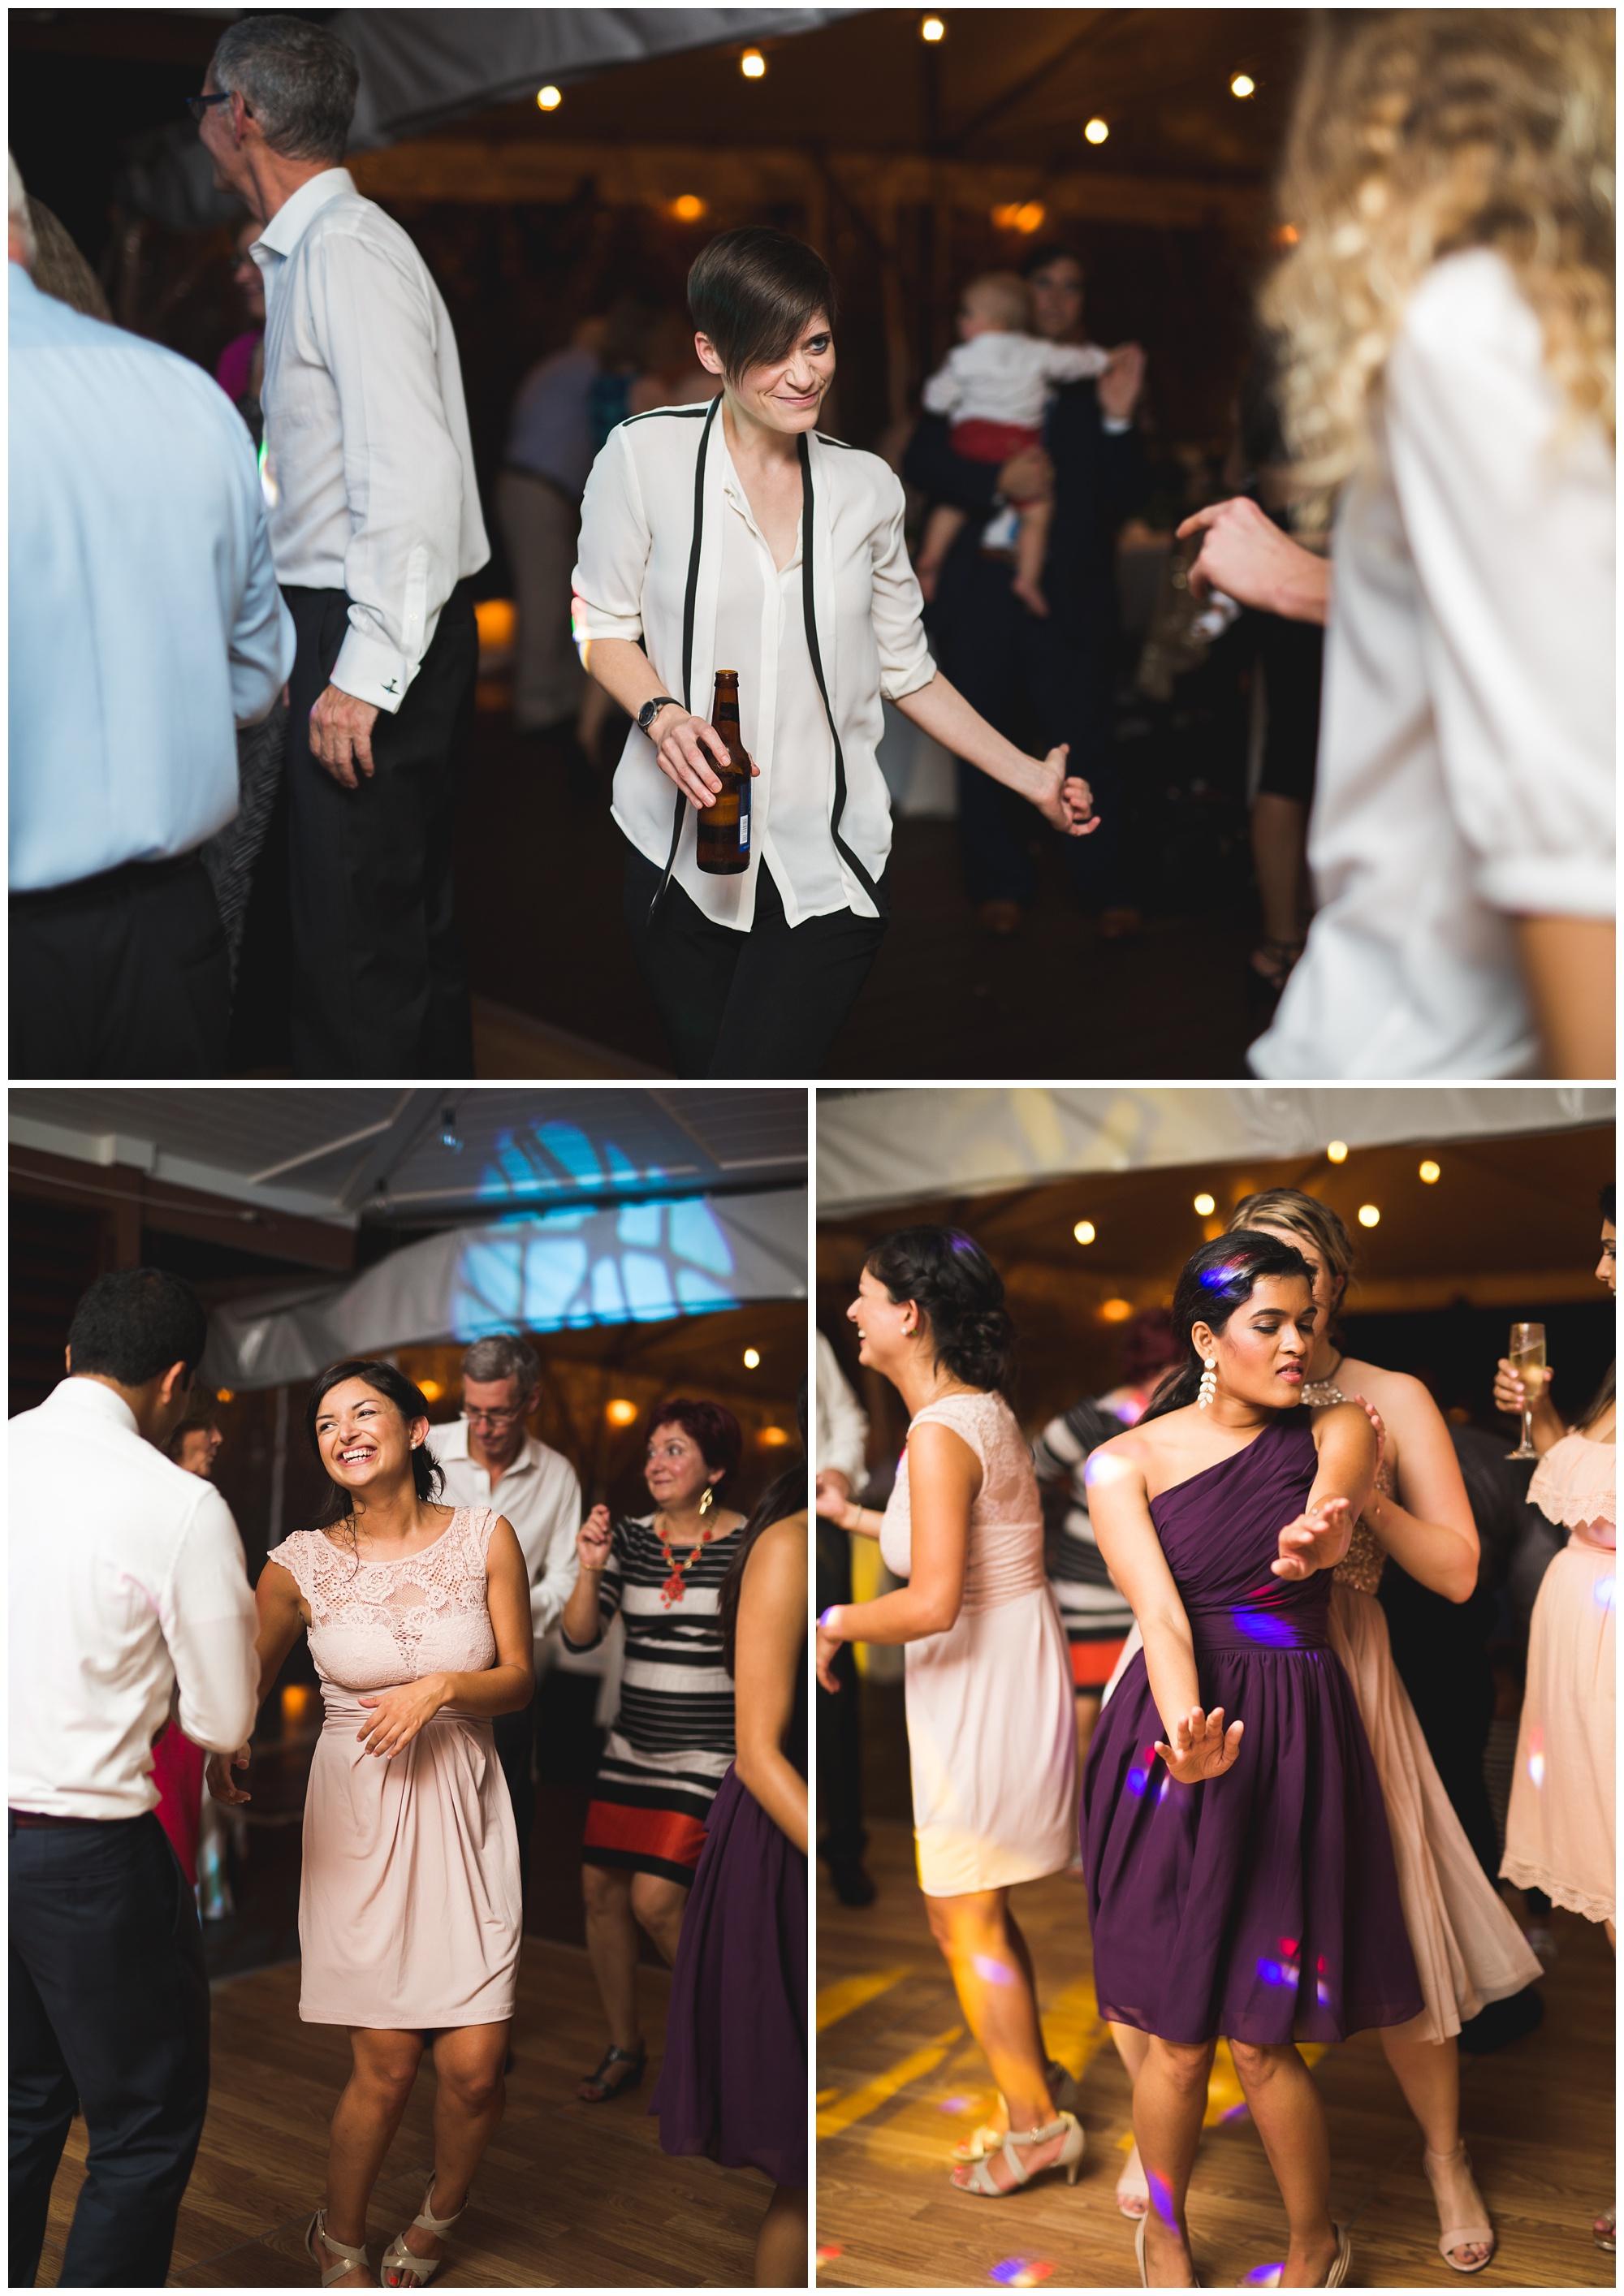 raleigh-wedding-photography-2.jpg